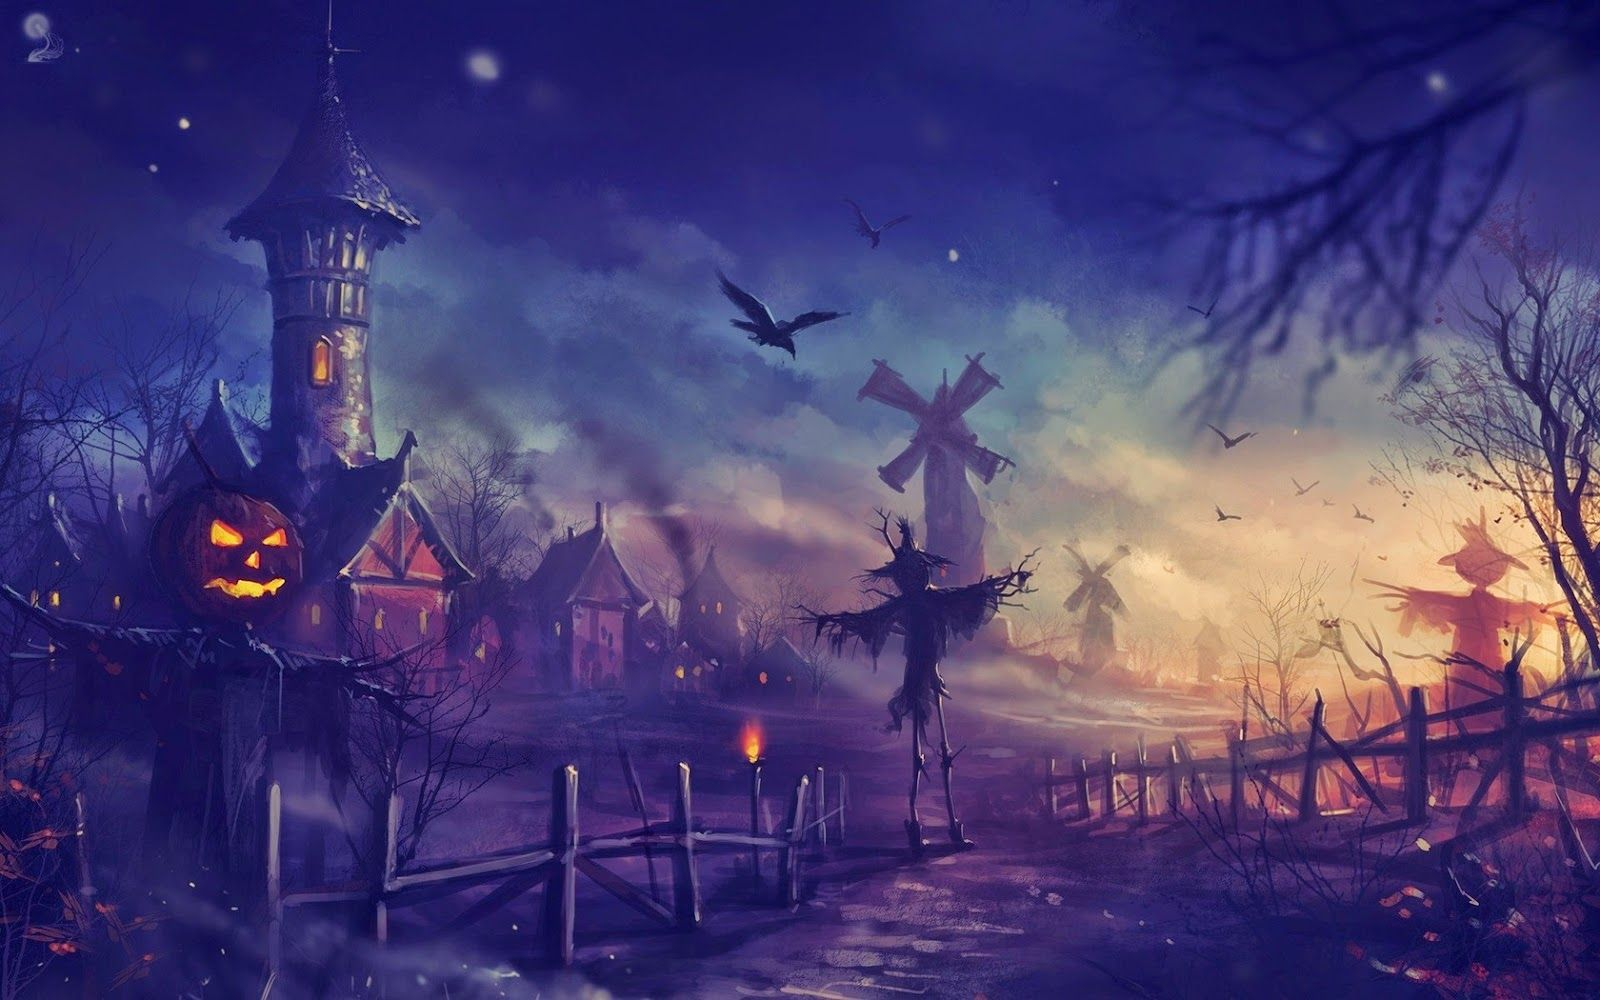 Pixhome Halloween Scary Horror Nights Scarecrow Pumpkin Haunted House Hd Images Halloween Wallpaper Halloween Pictures Halloween Backgrounds